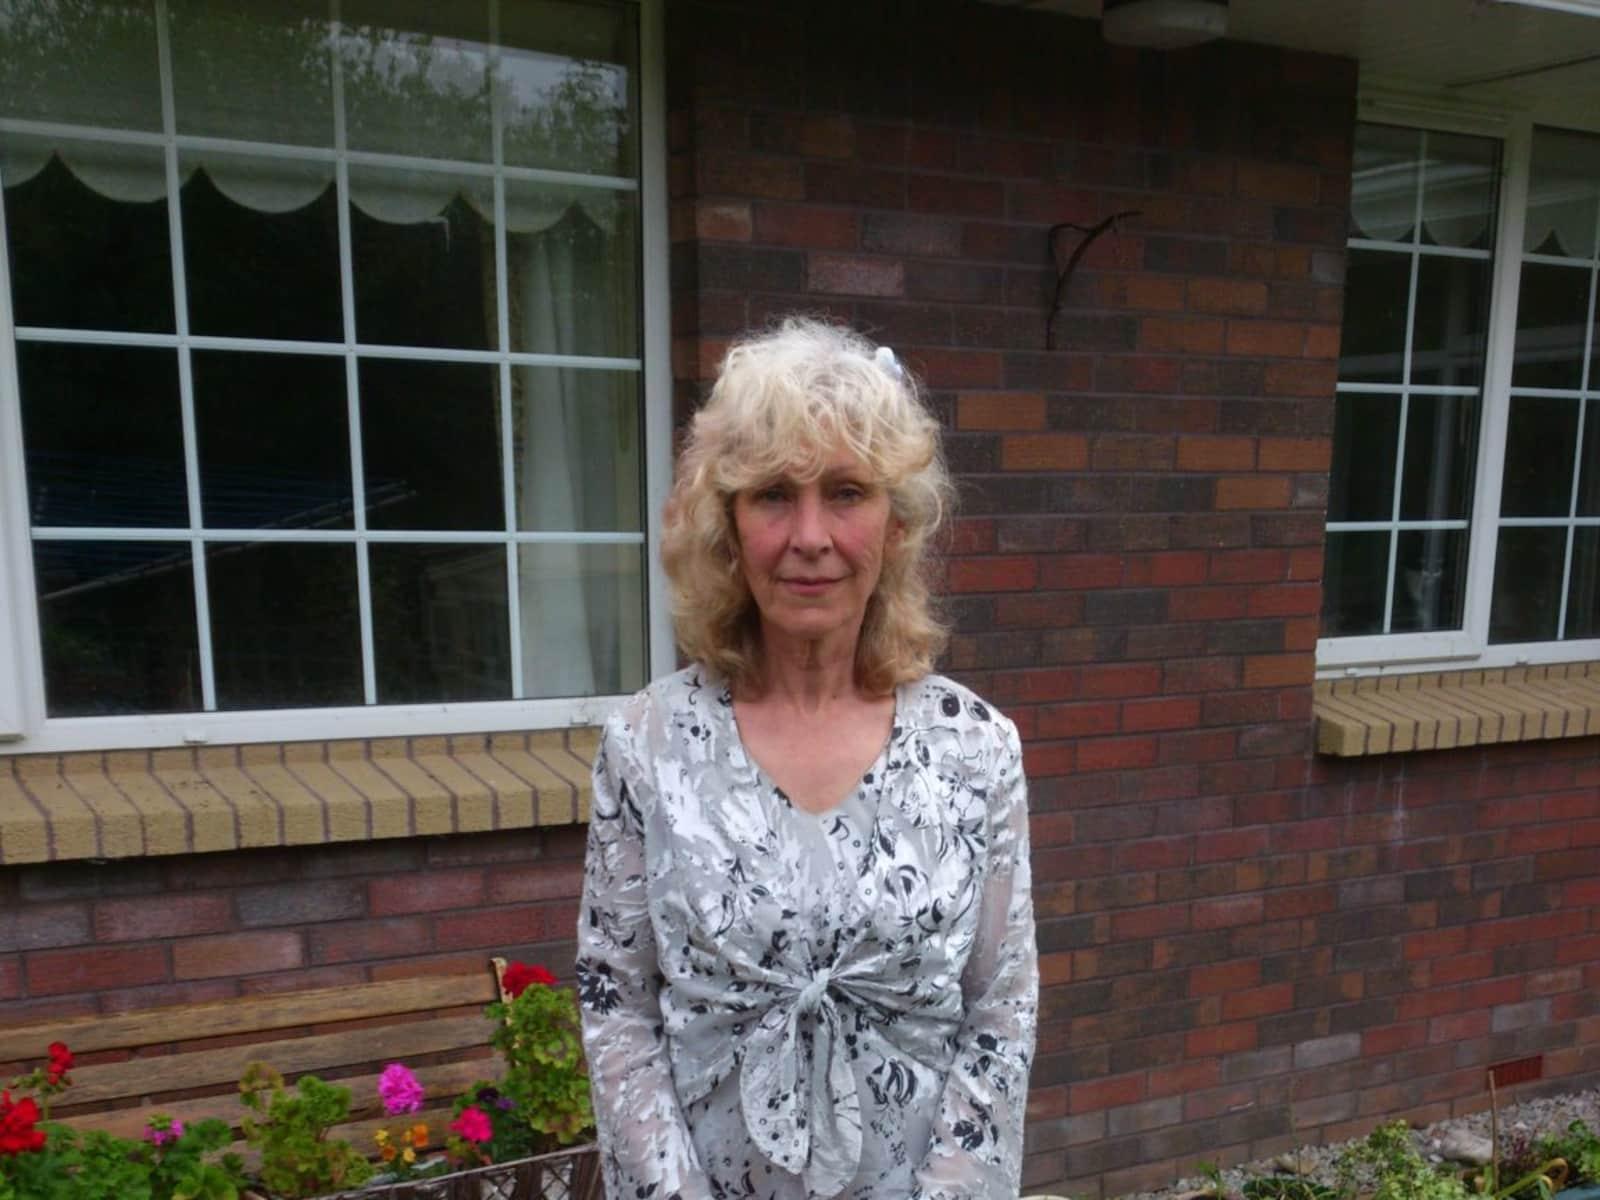 Rowena from Desertmartin, United Kingdom